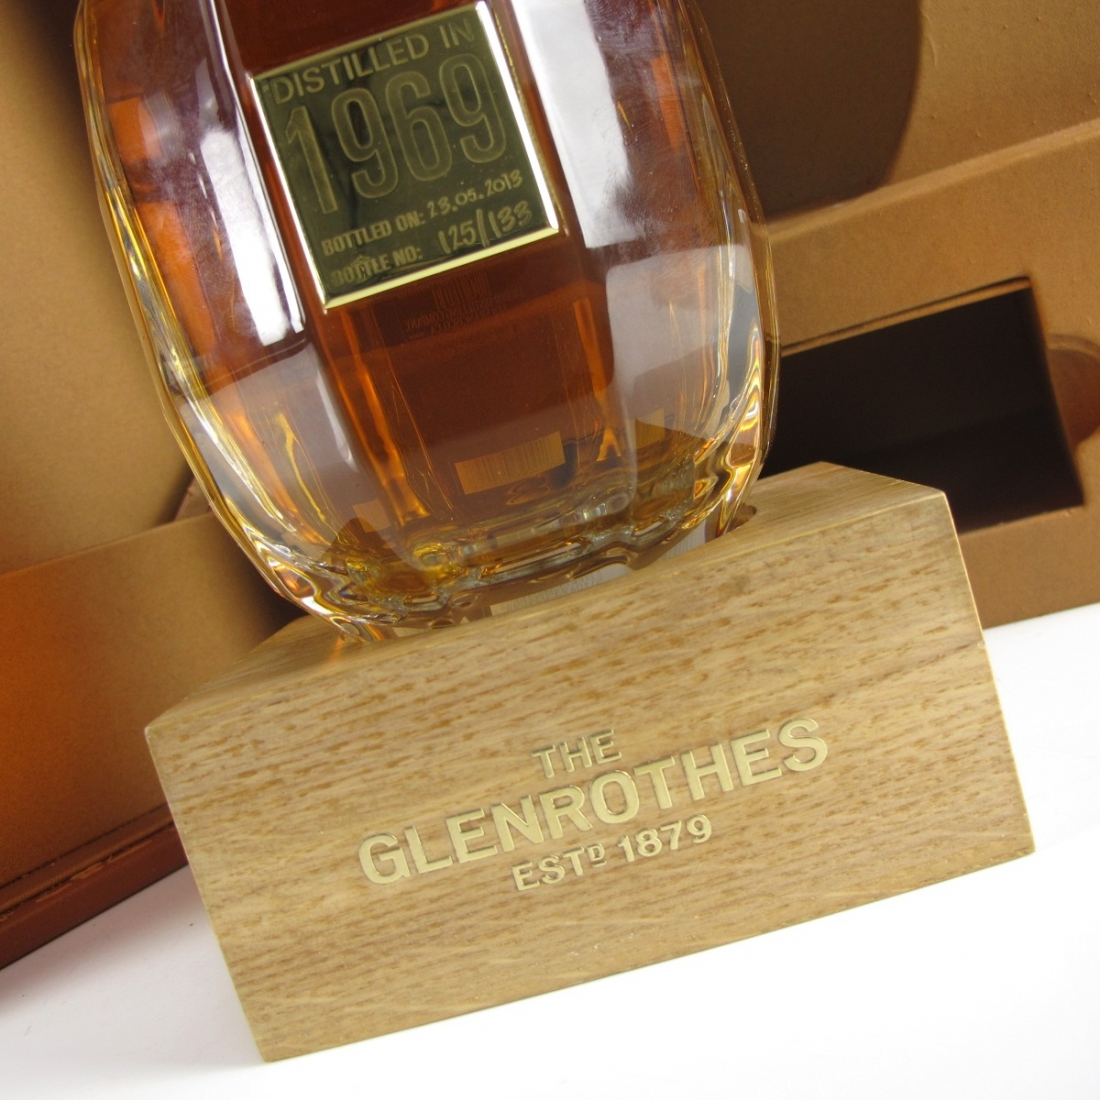 Glenrothes 1969 Extraordinary Single Cask #11485